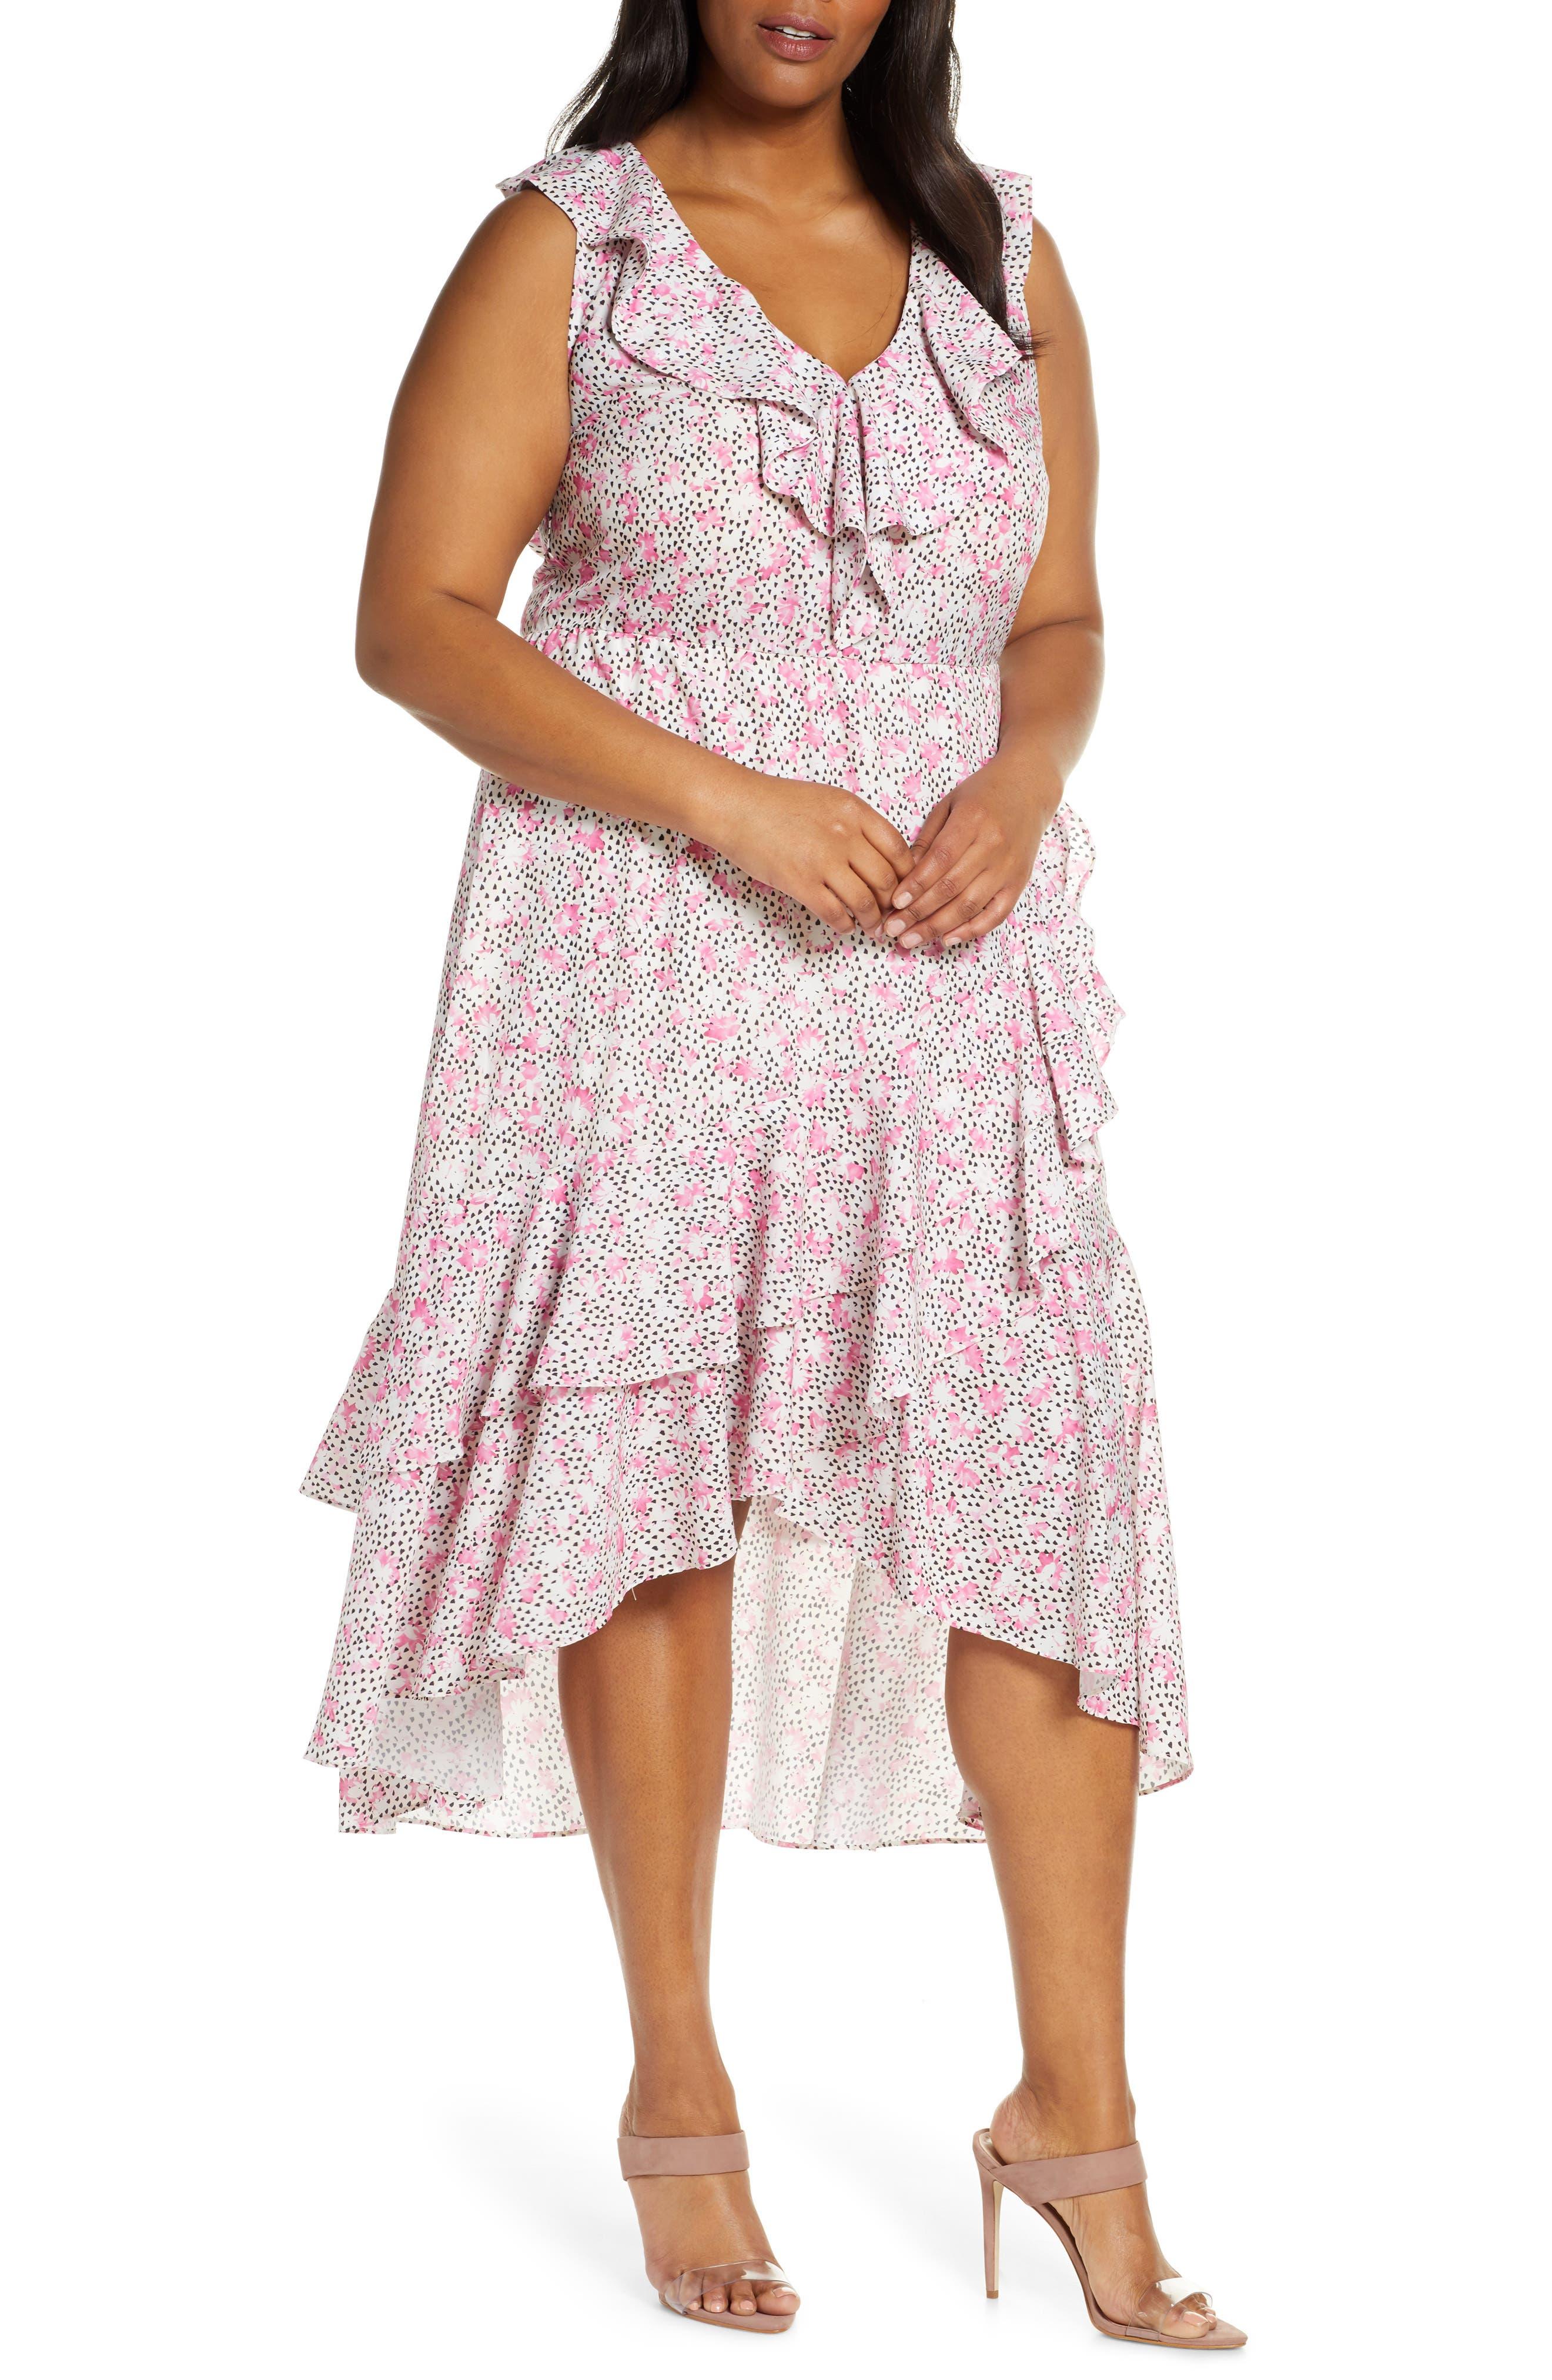 1930s Day Dresses, Tea Dresses, House Dresses Plus Size Womens Eloquii Ruffle Detail High Low Dress $114.95 AT vintagedancer.com